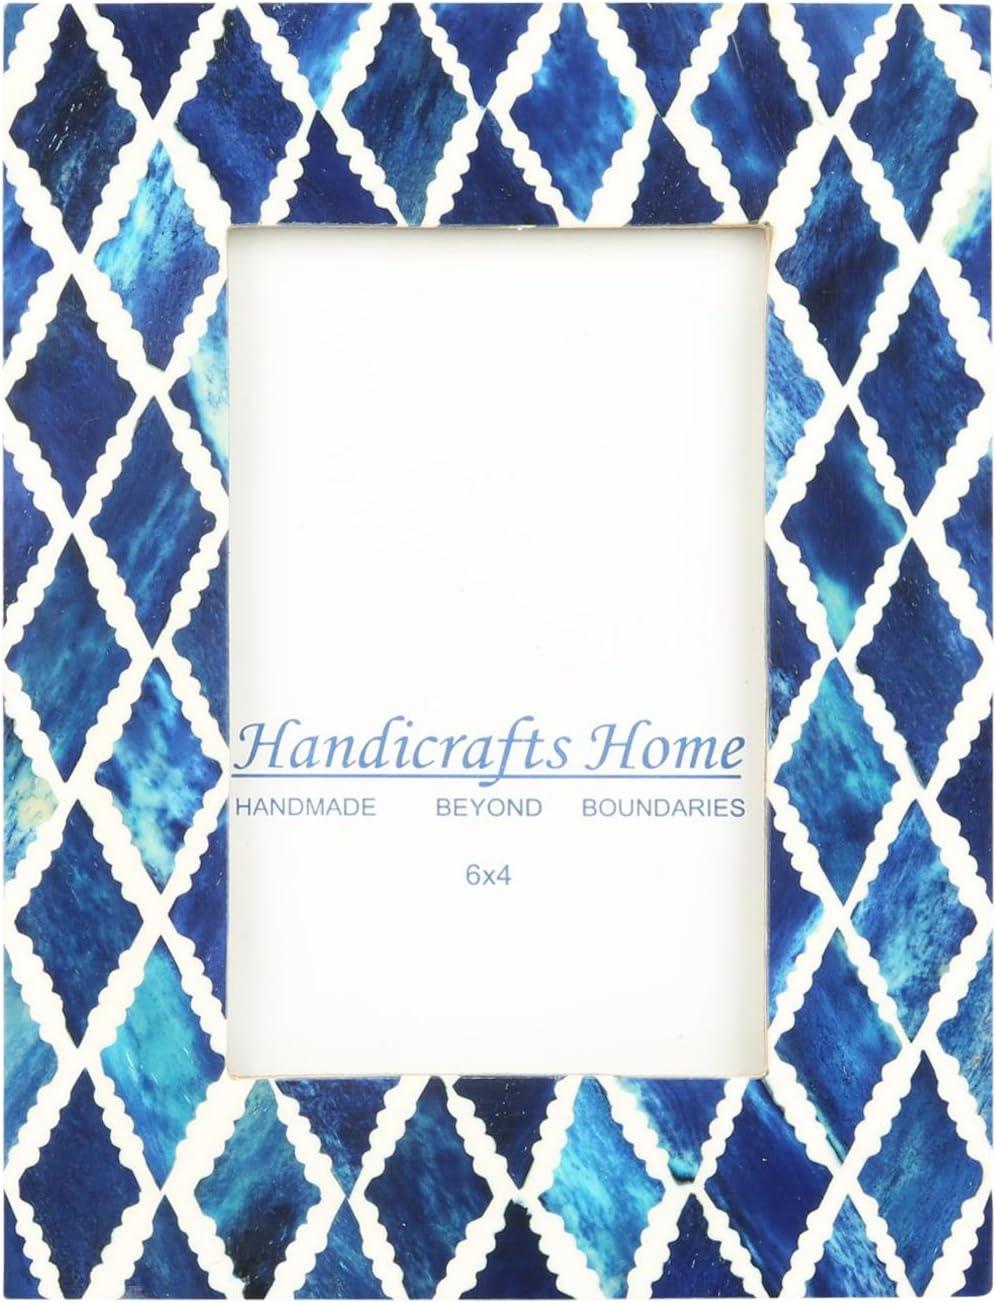 Handicrafts Home 4x6 Photo Frame Blue White Bone Mosaic Moroccan Picture Frames